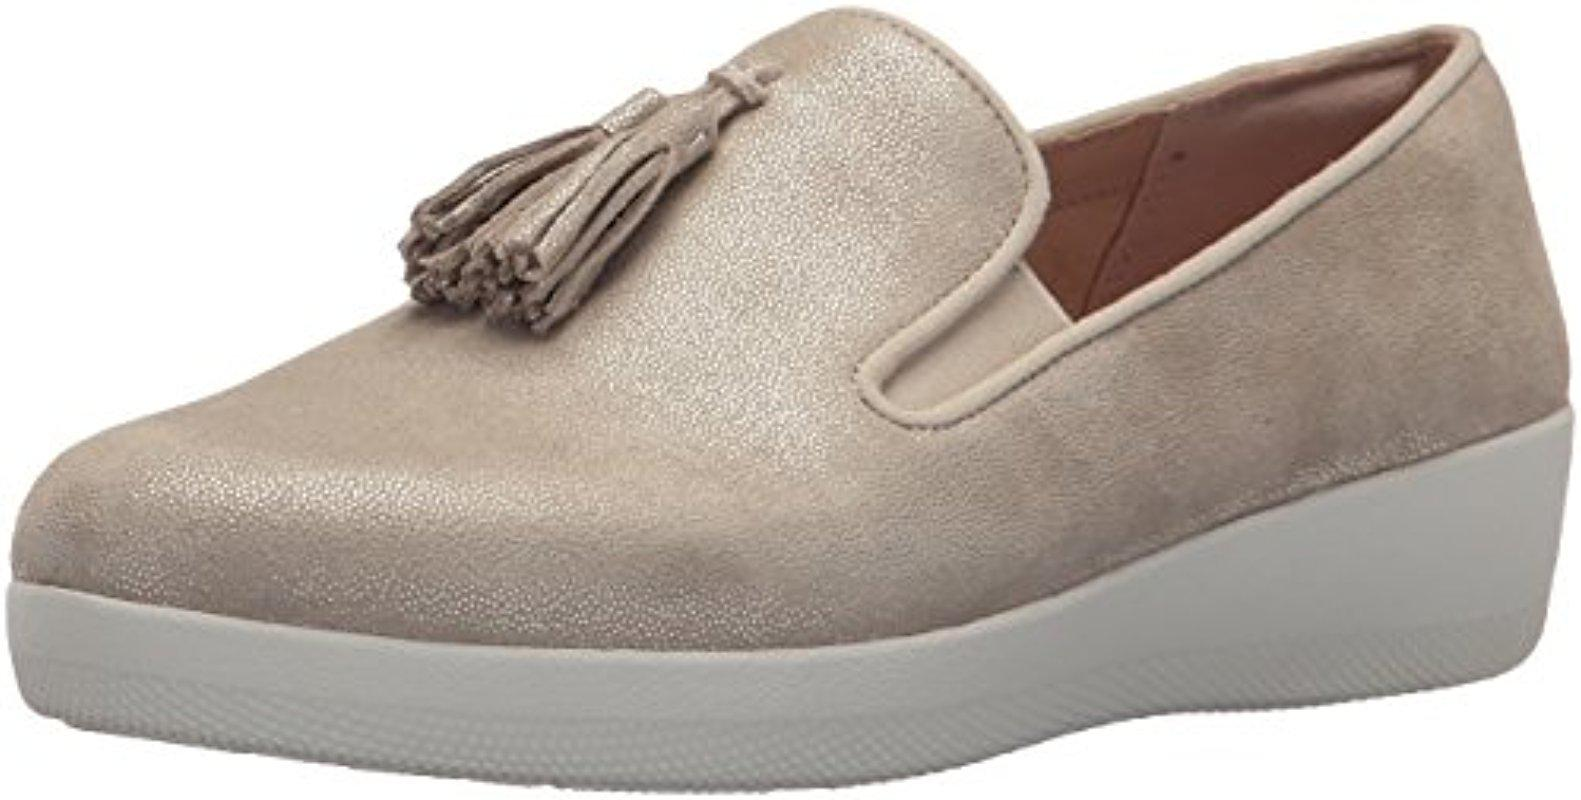 9351fcd18829 Fitflop. Women s Tassel Superskate Shimmer Loafer